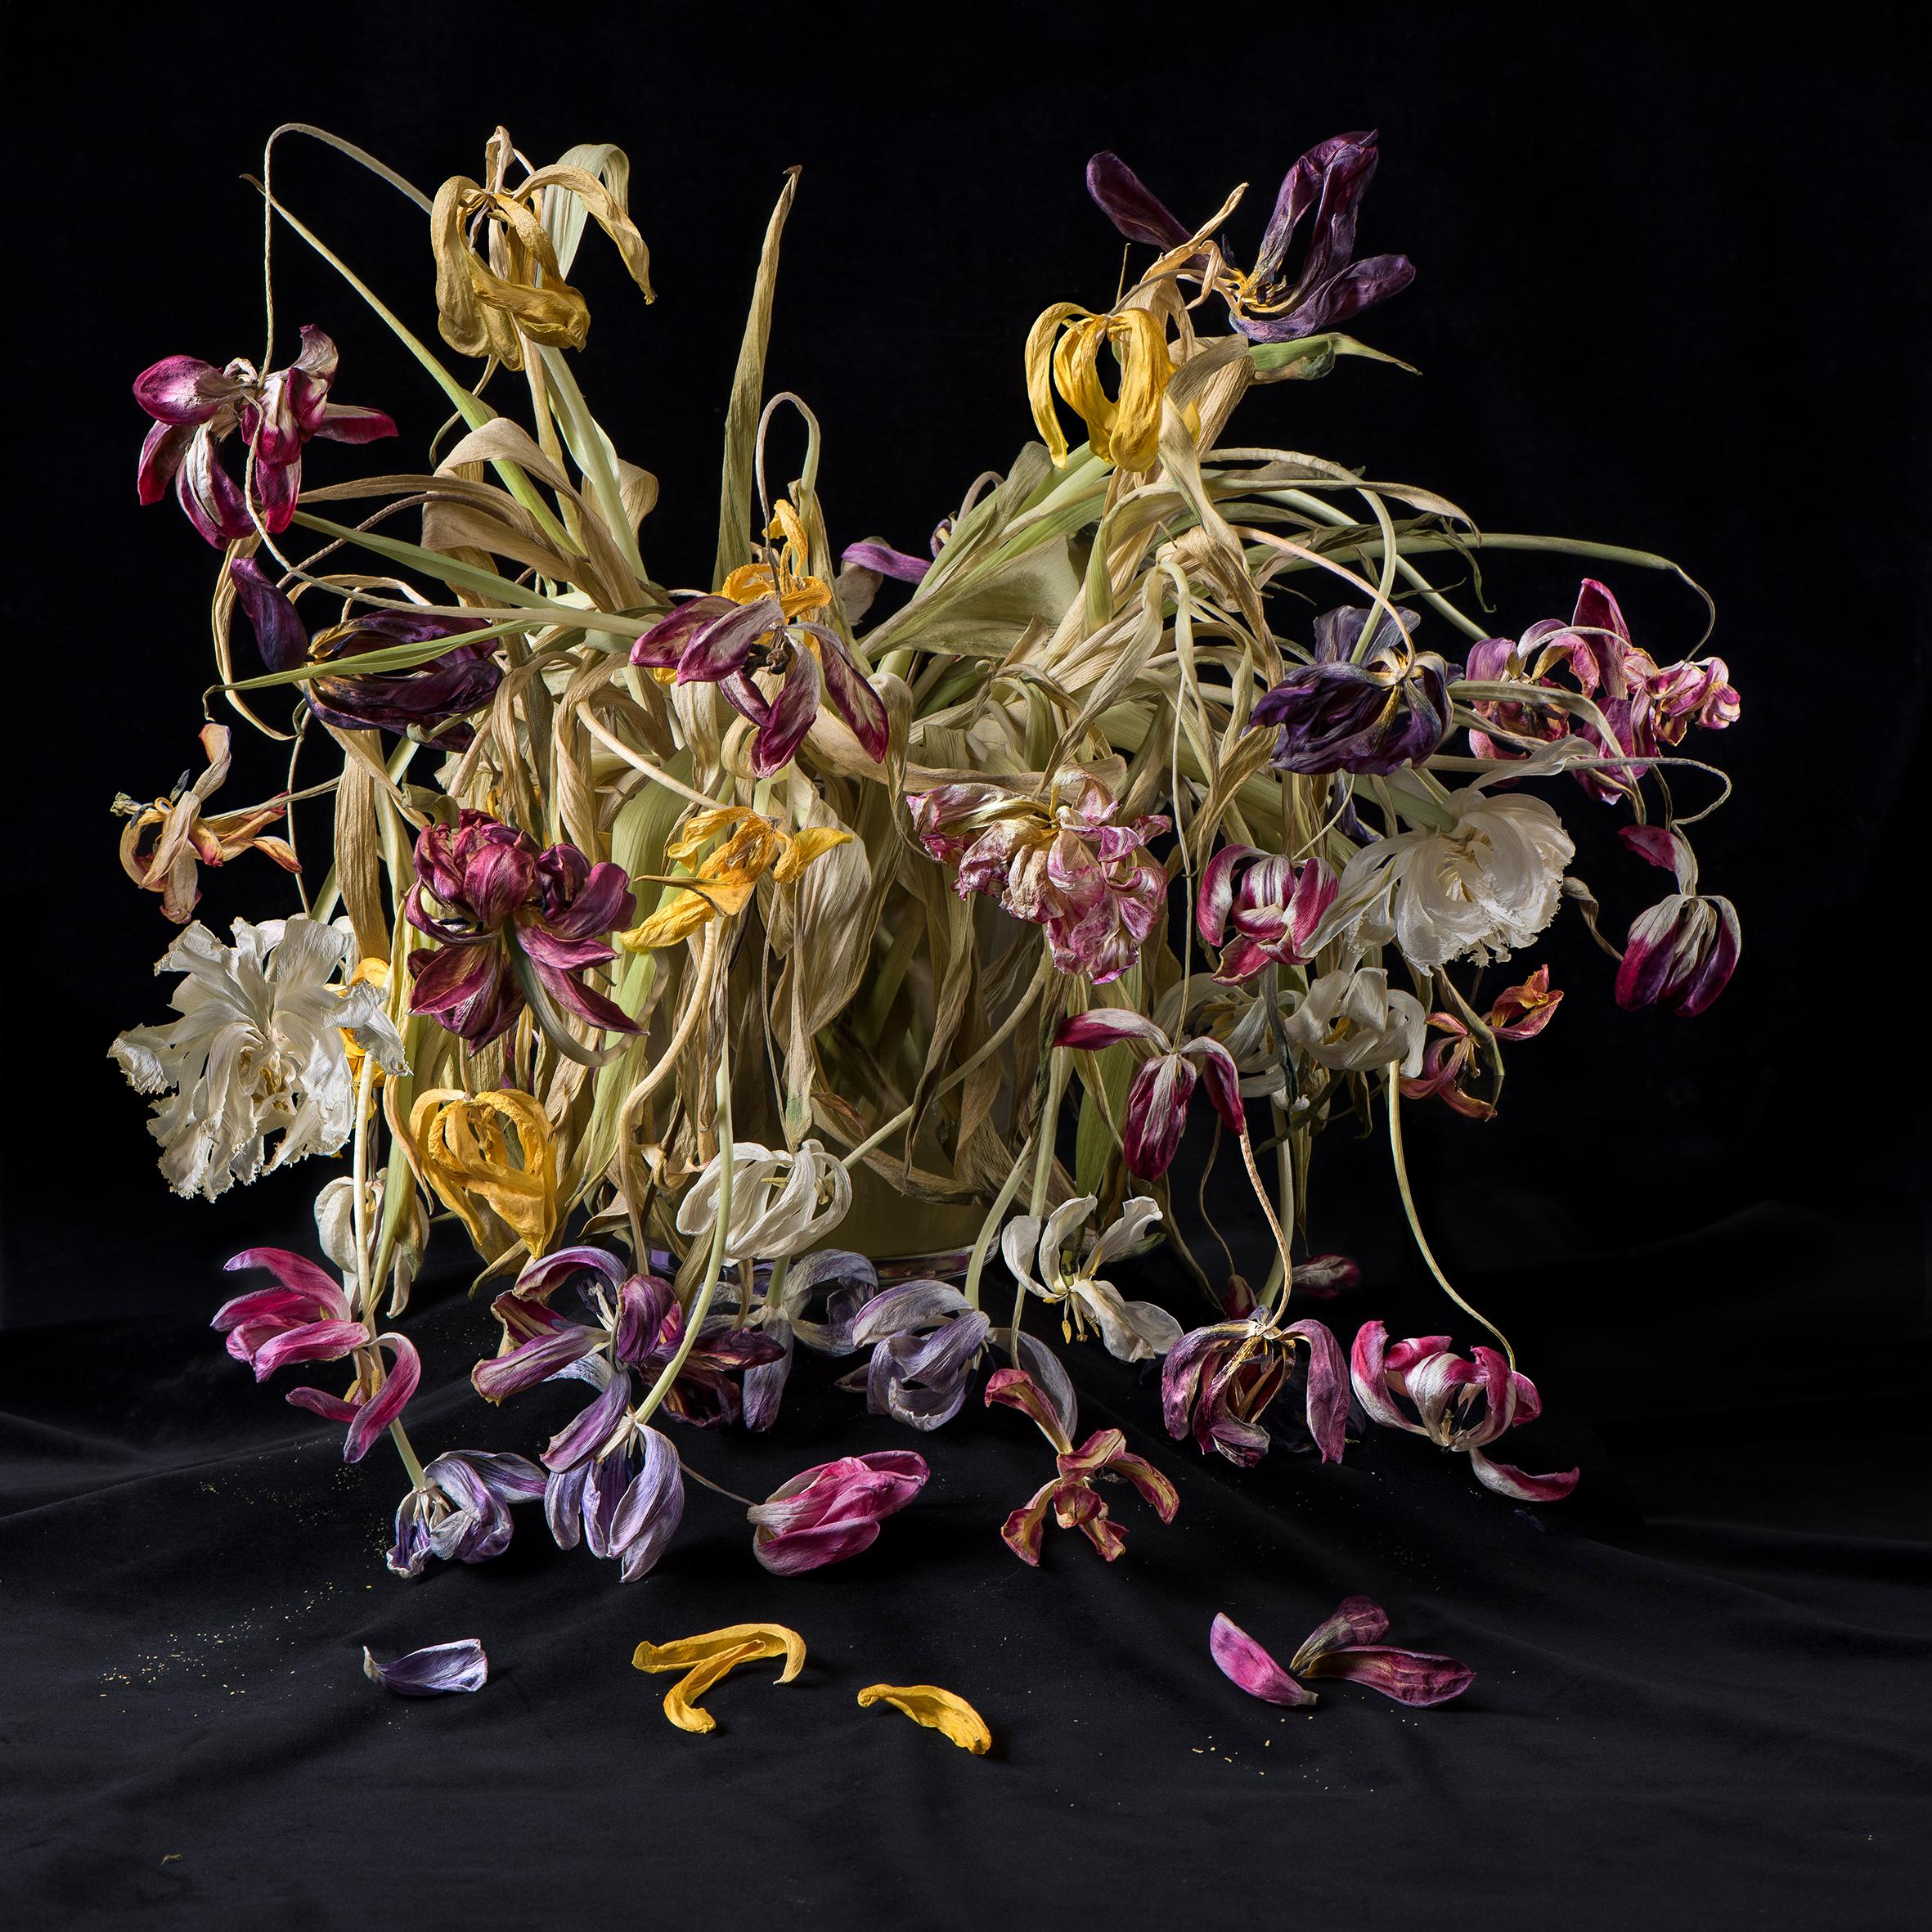 Blossom_Anna-Halm-Schudel_01_Tulpen-Bouquets.jpg